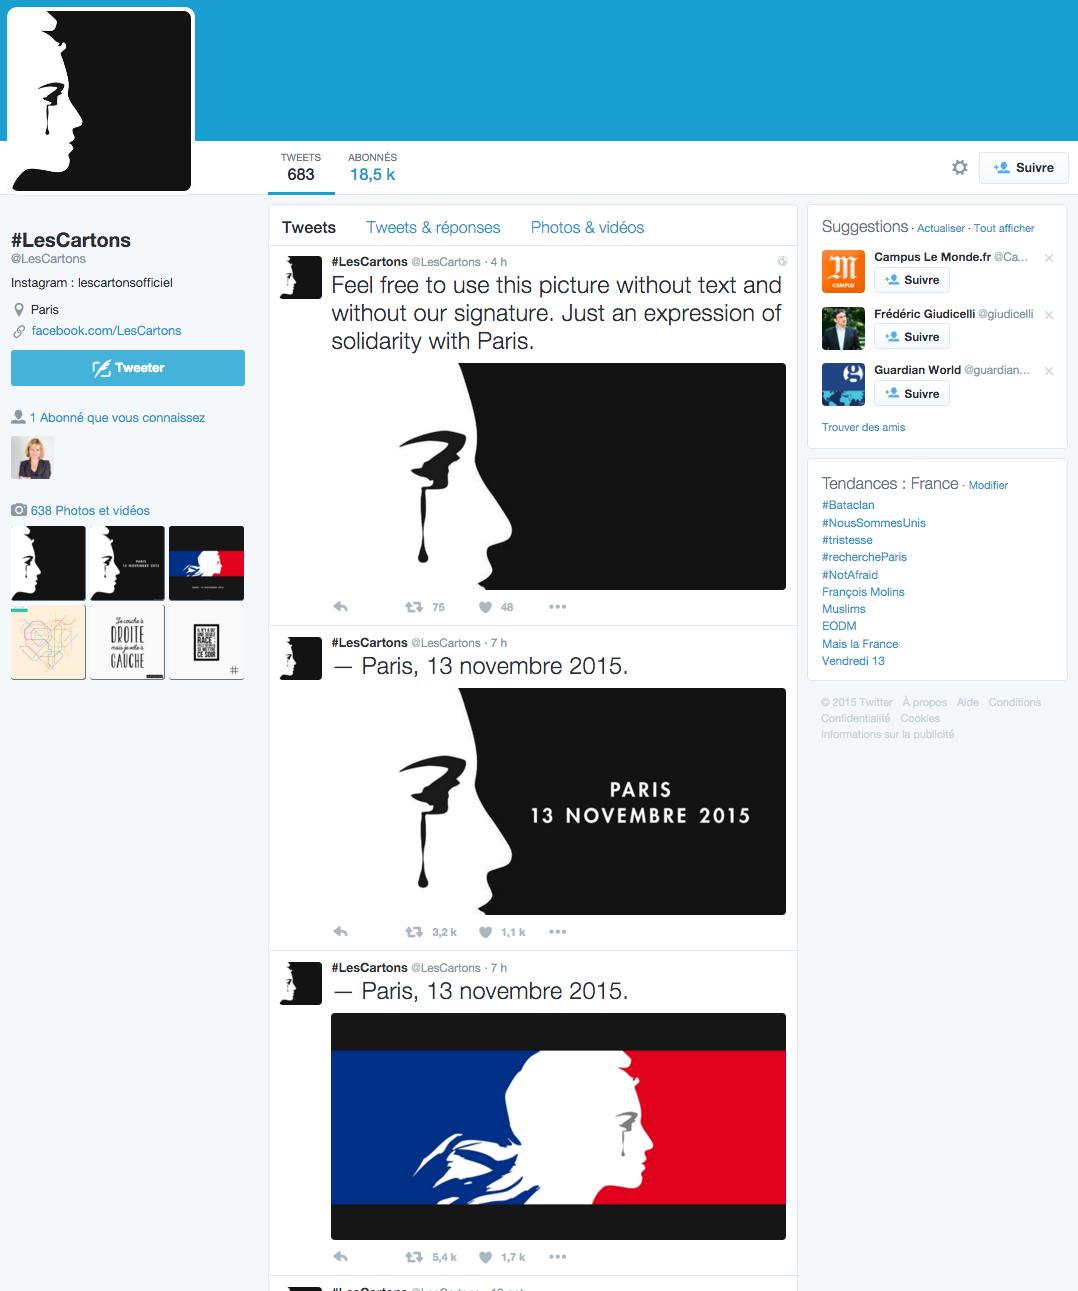 Les Cartons. Twitter 14/11/15